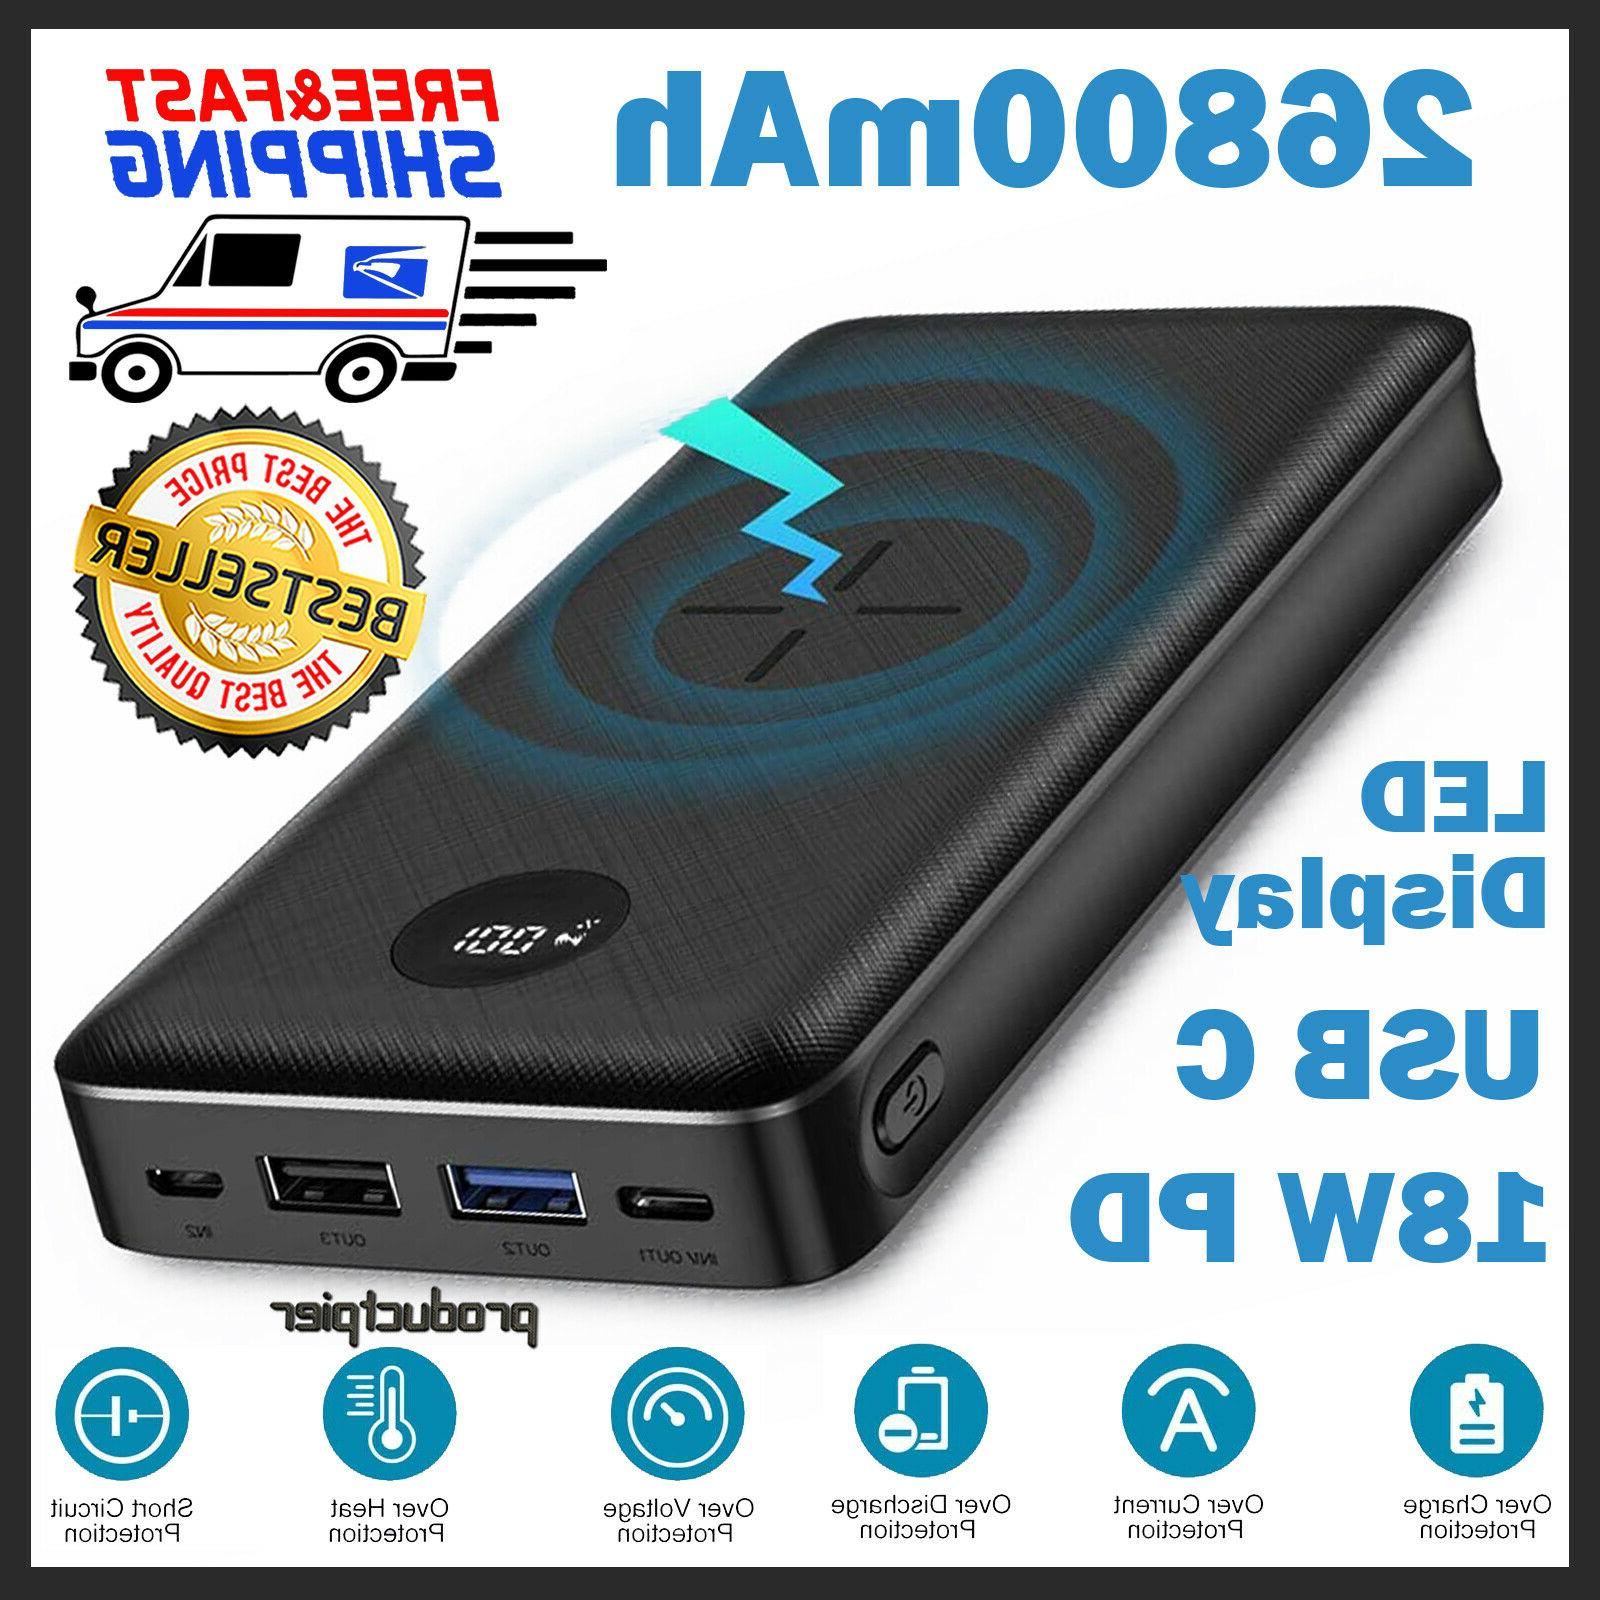 ravpower xtreme 26800mah external battery charger power